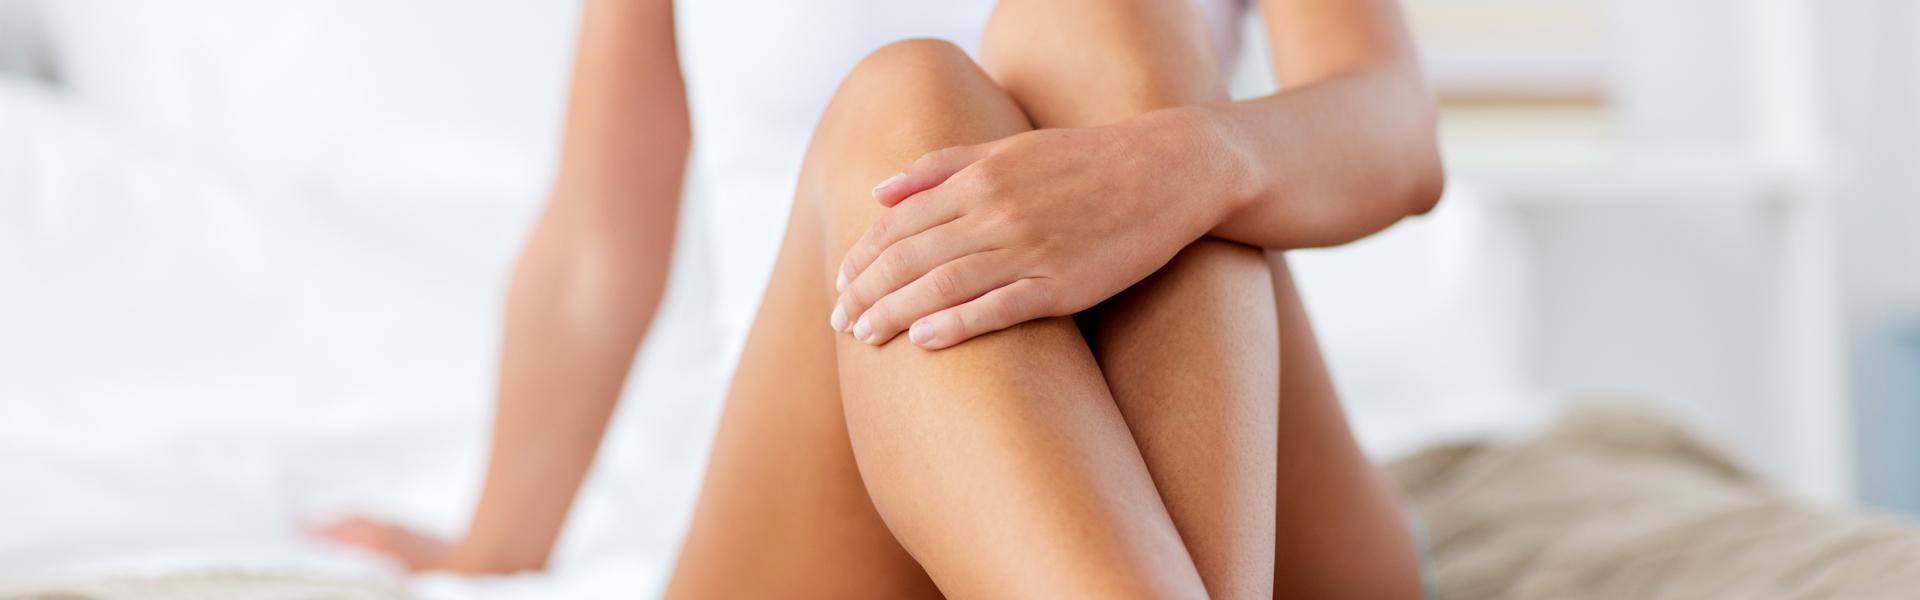 ISM Prevenir infecciones de orina